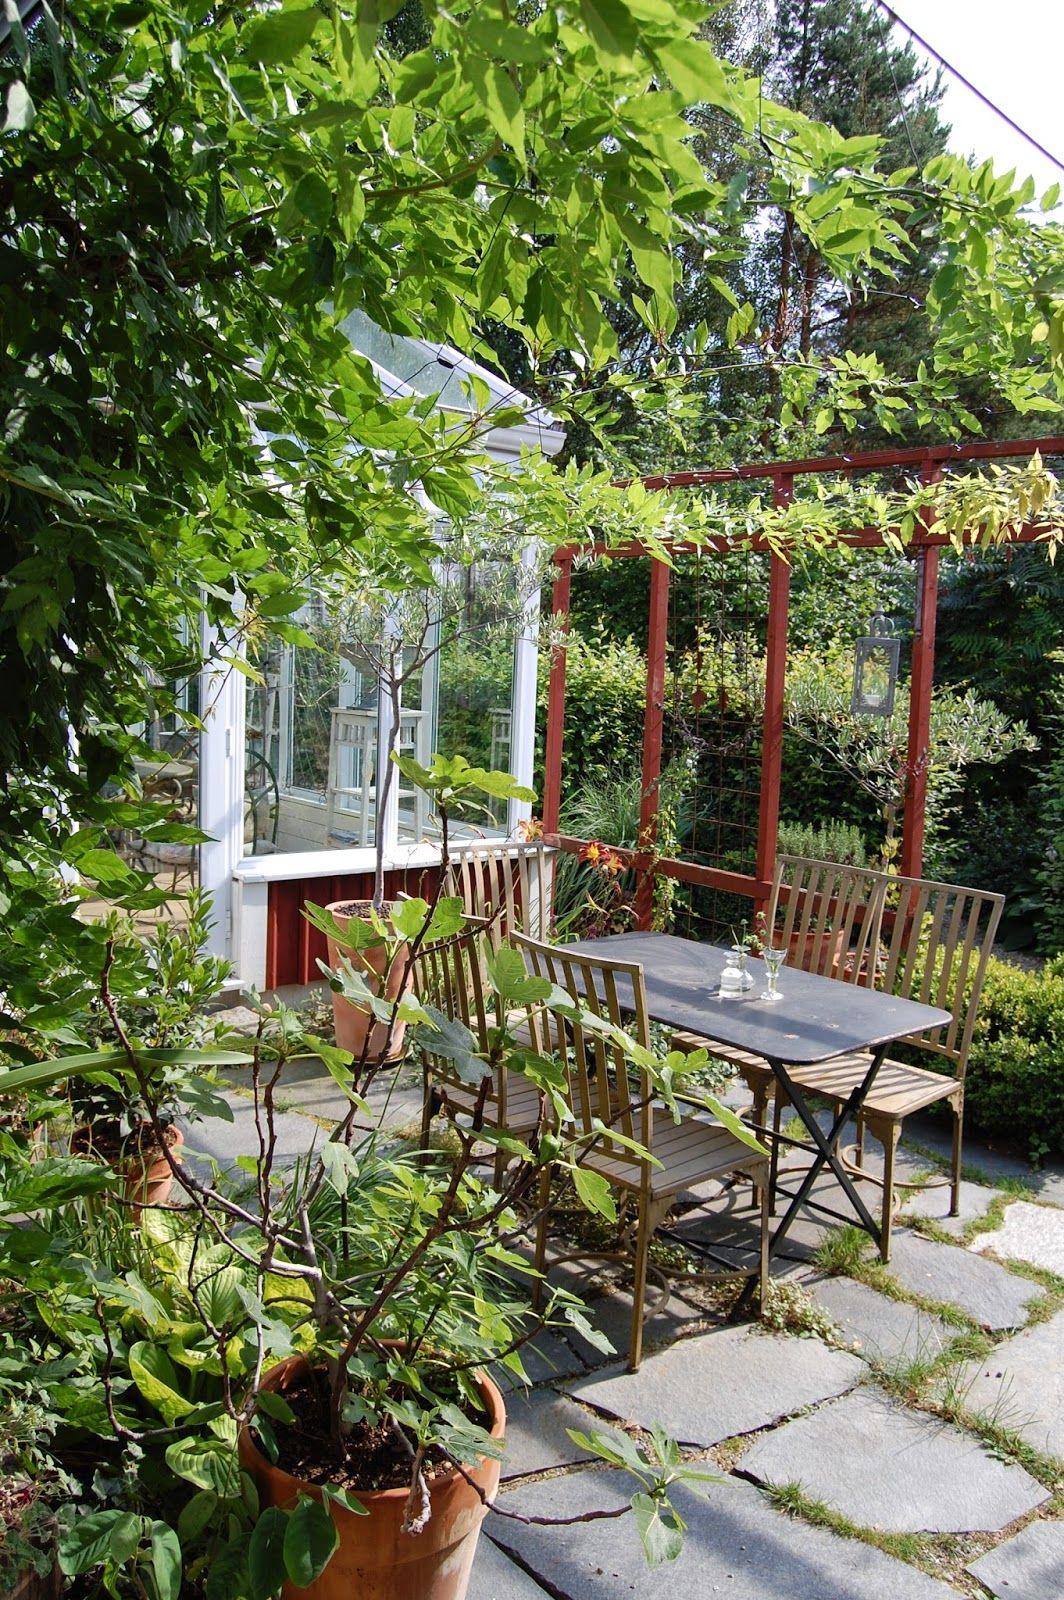 Little Greenhouse With Patio And Rusty Steel Trellis.Trädgård Och Keramik